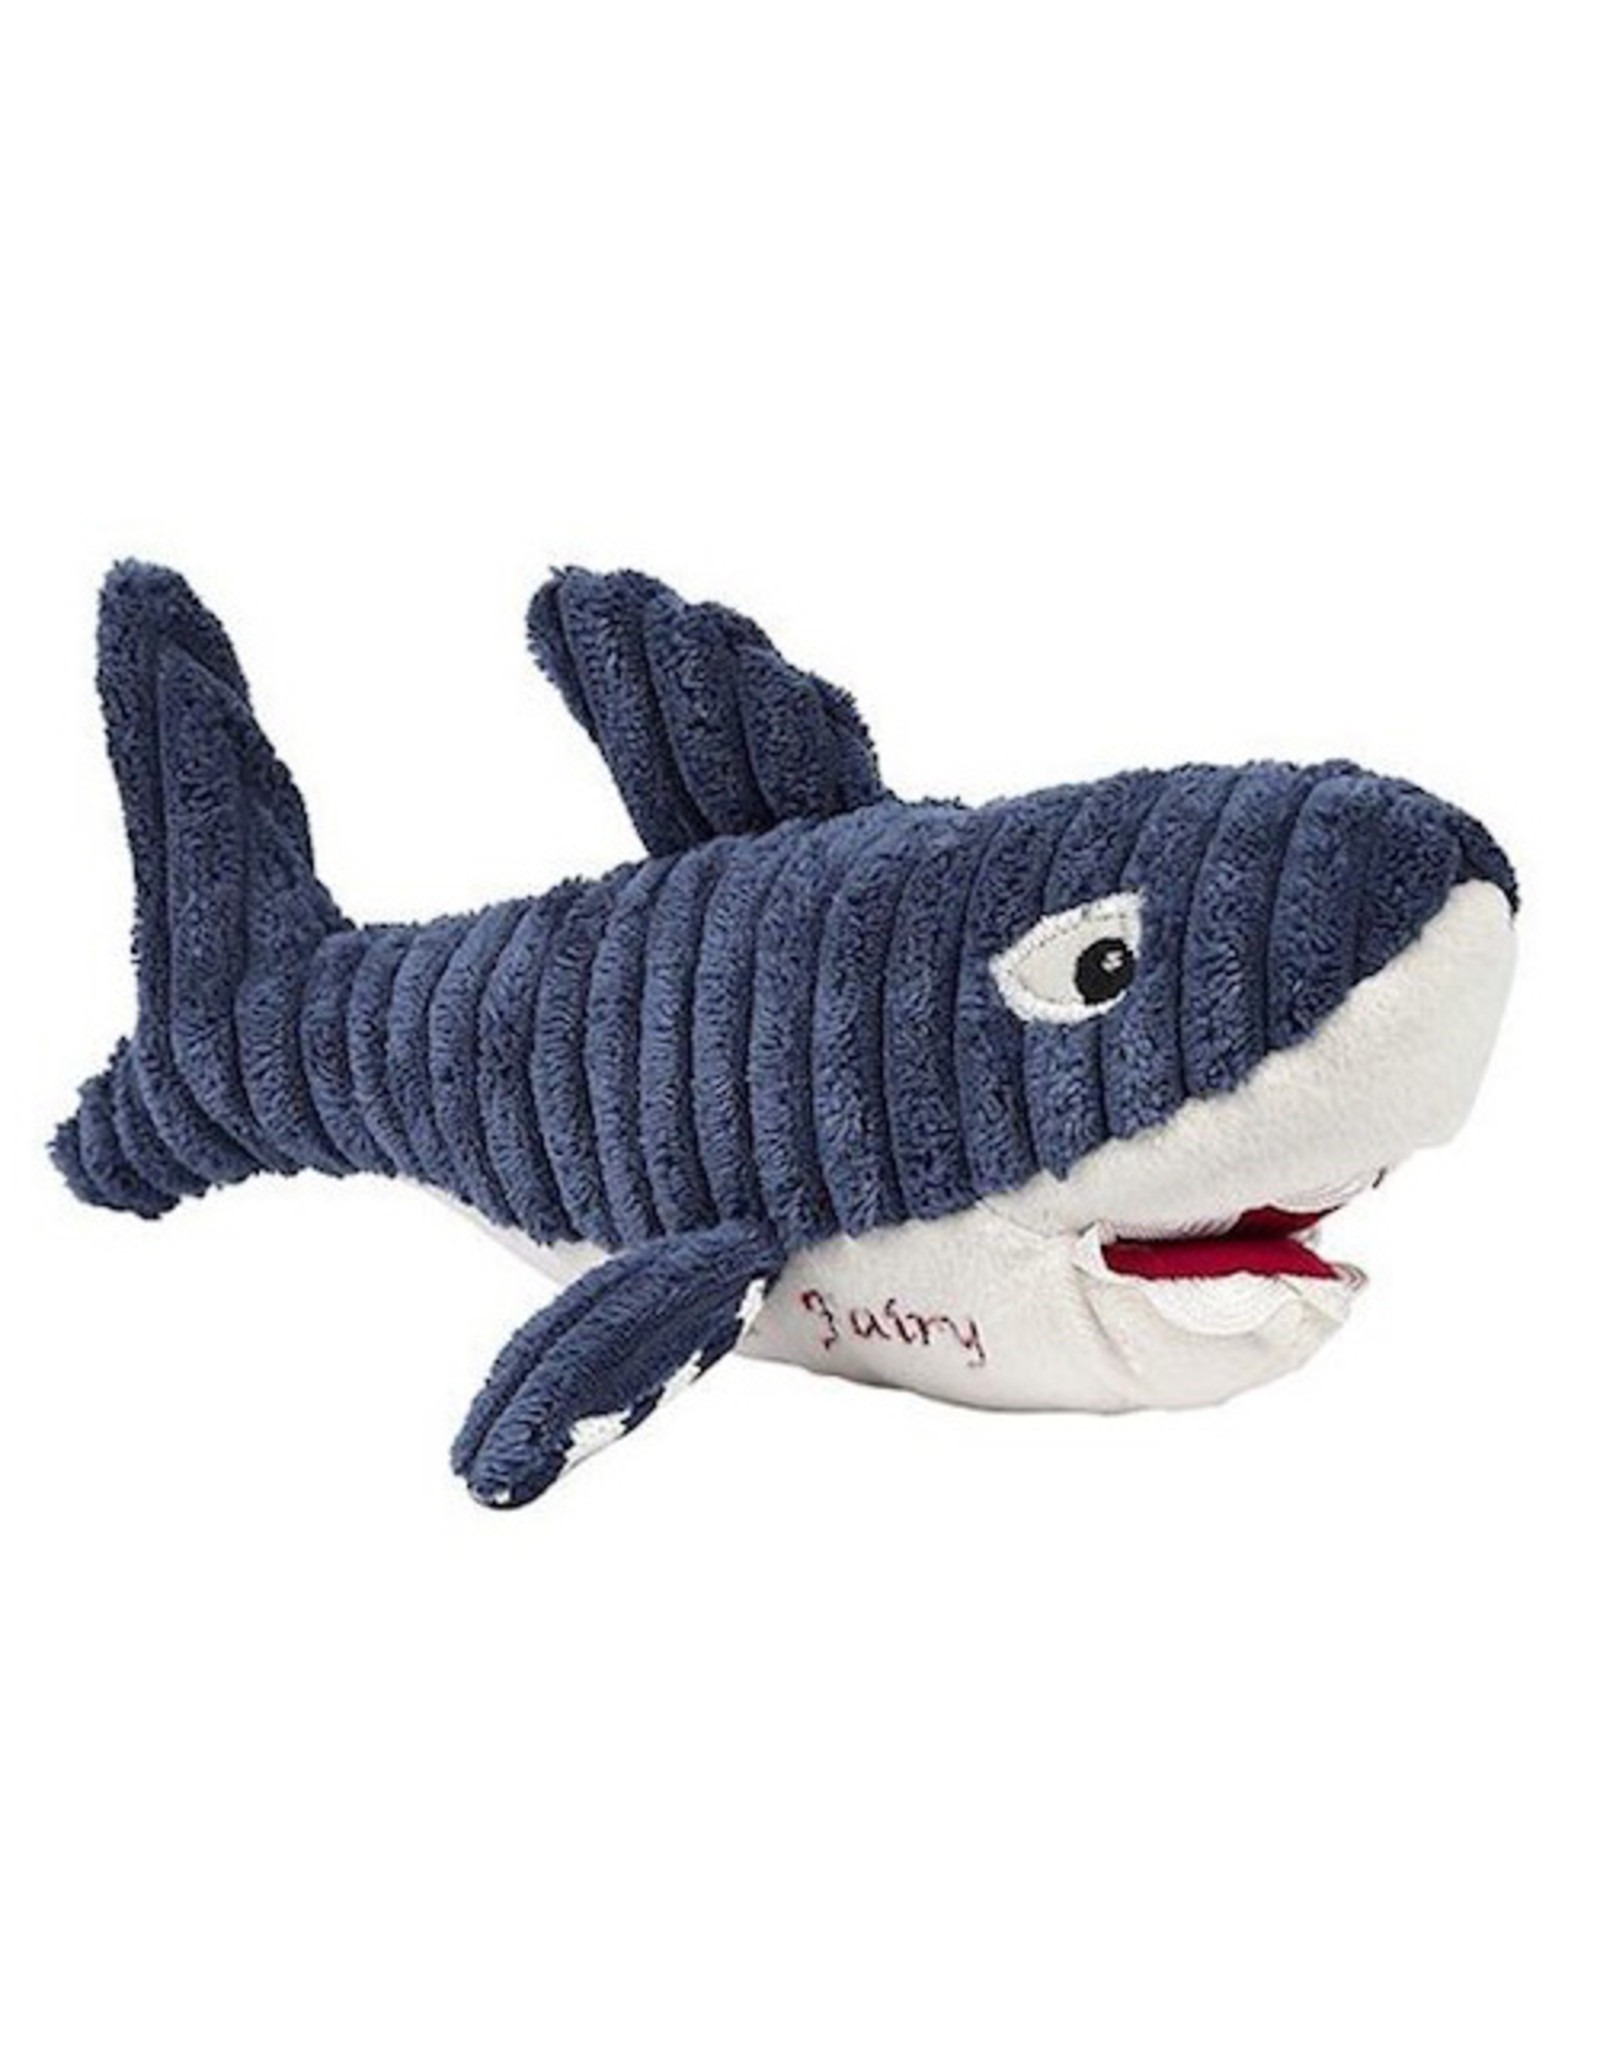 Maison Chic Bruce the Shark Tooth Fairy